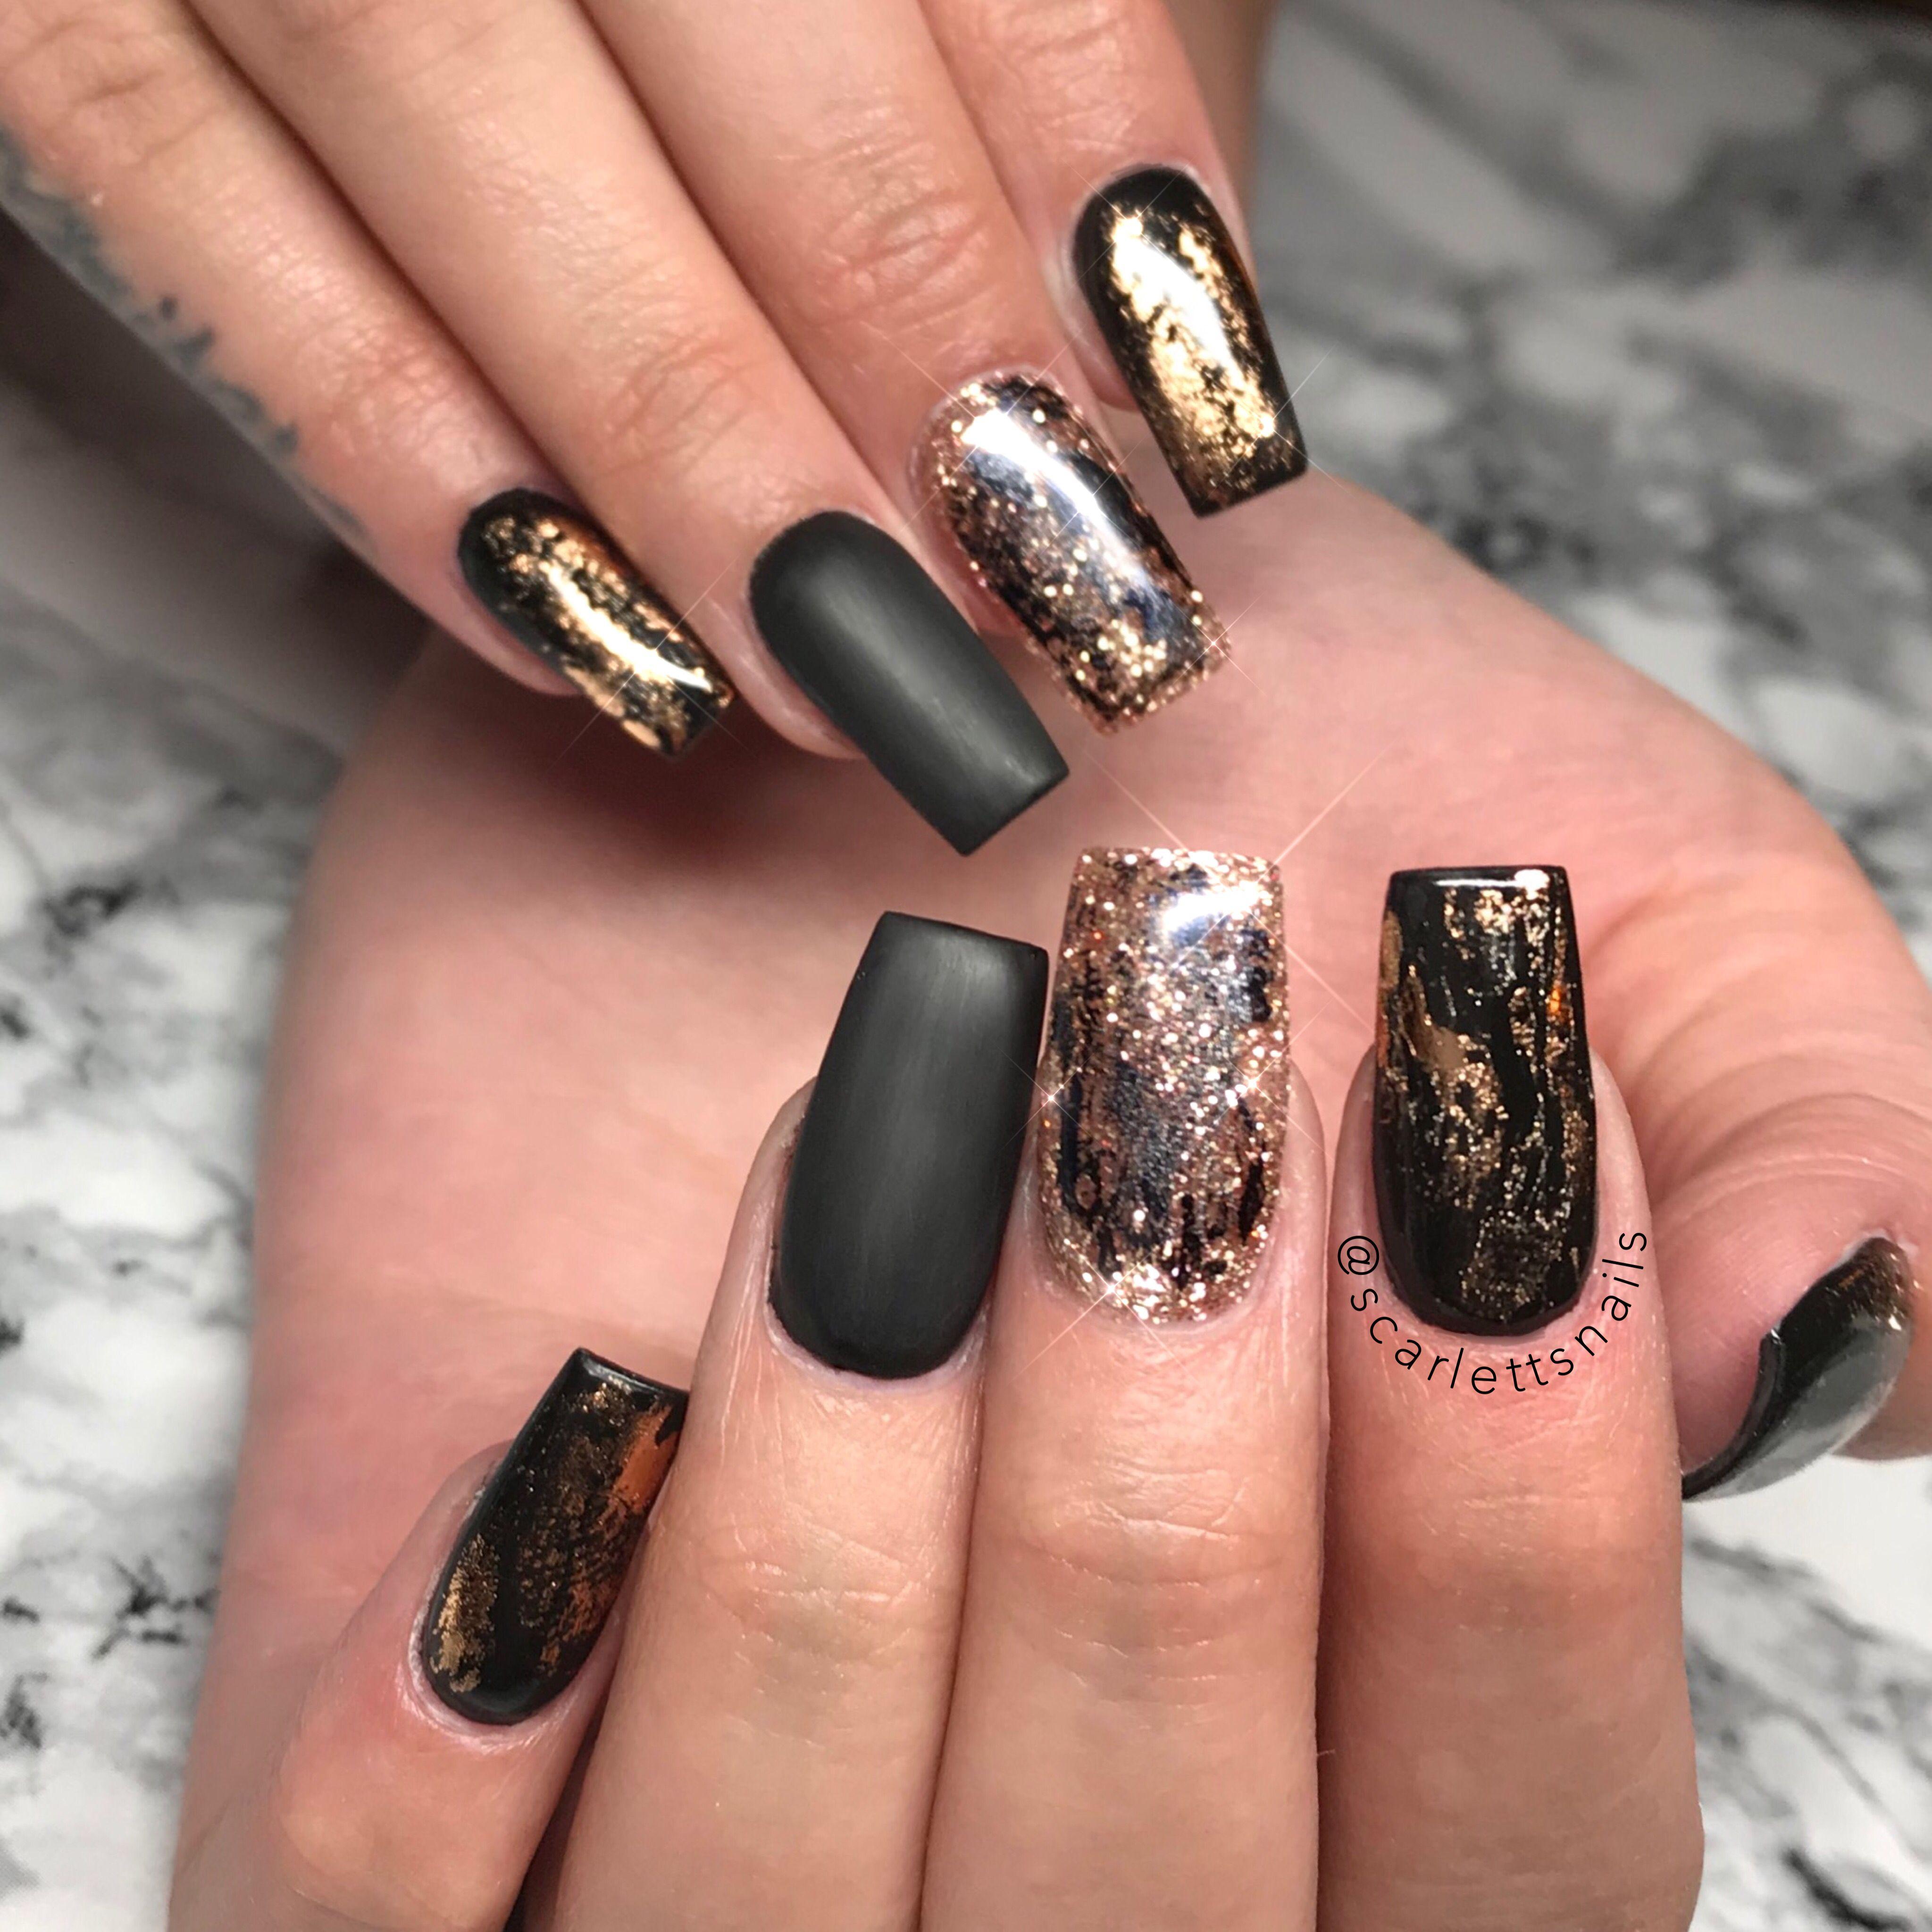 Scarlettsnails Matte Black Rose Gold Long Square Gel Nails Matte Nails Design Square Gel Nails Rose Gold Nails